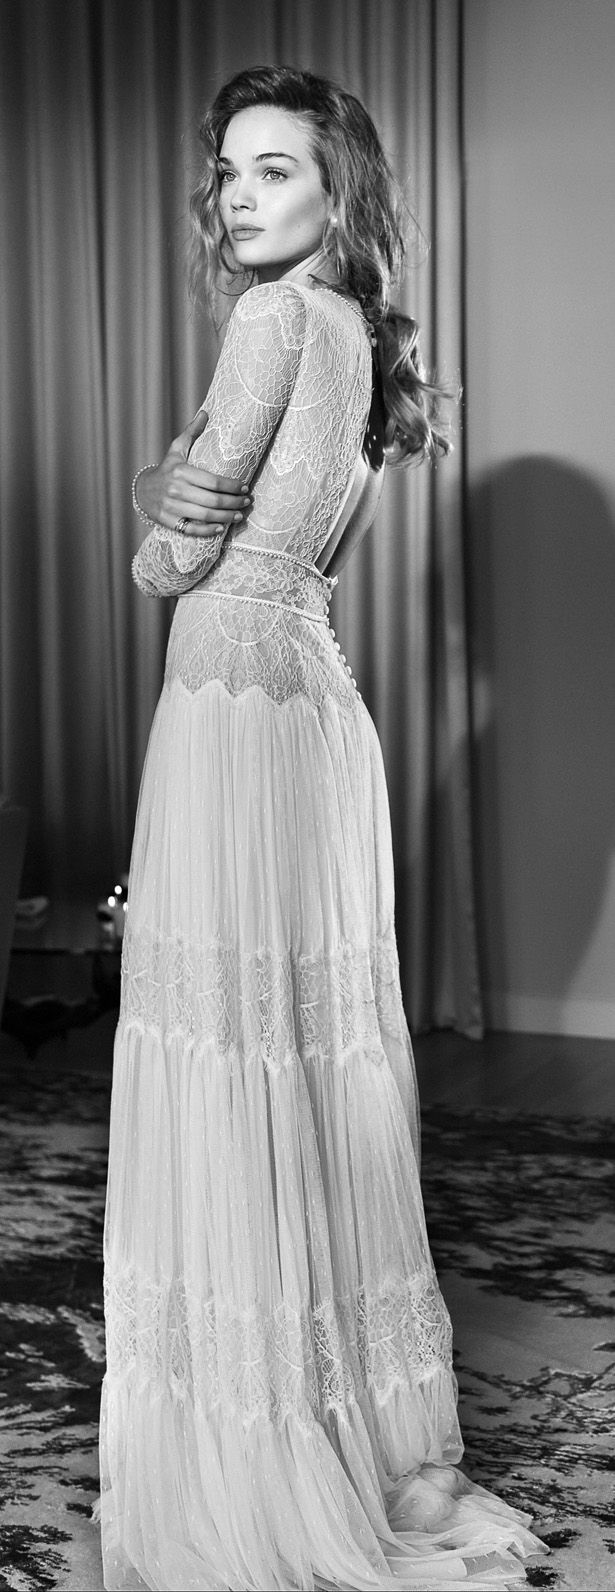 Lihi Hod 2015 Wedding Dress - Sophia